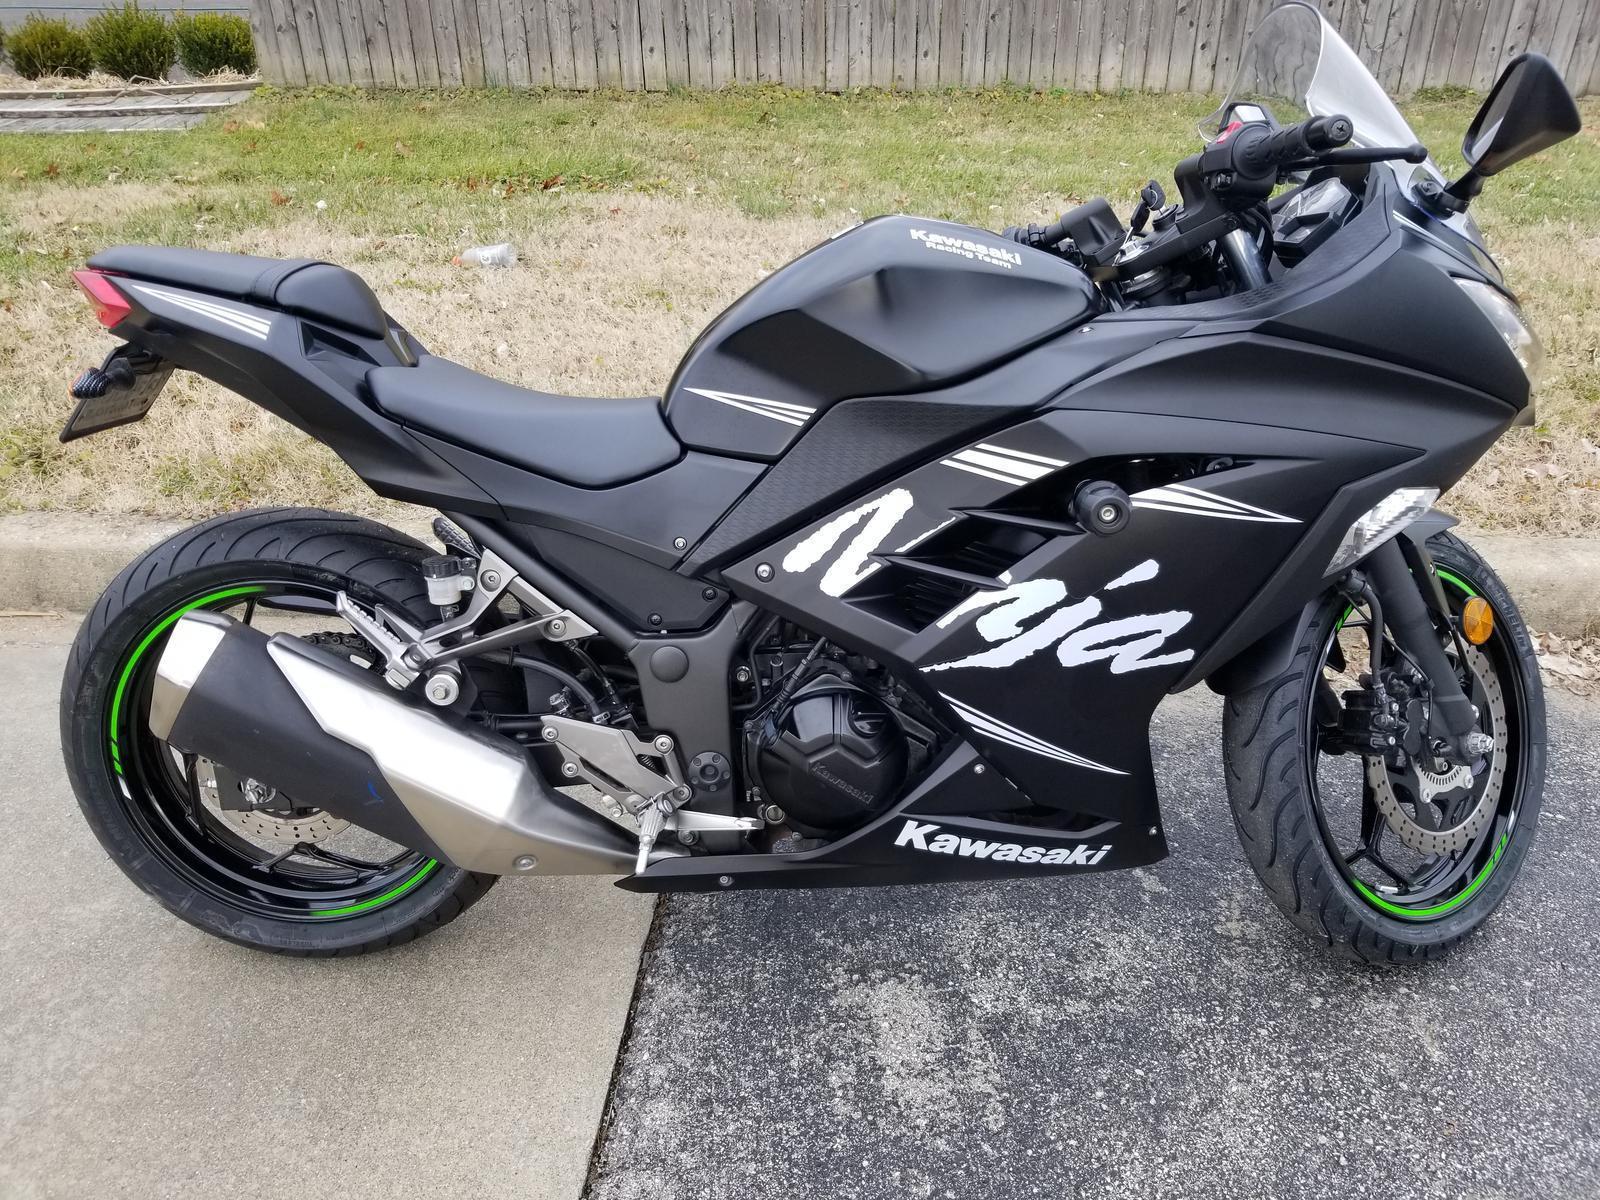 2017 Kawasaki Ninja 300 Abs Winter Test Edition For Sale In